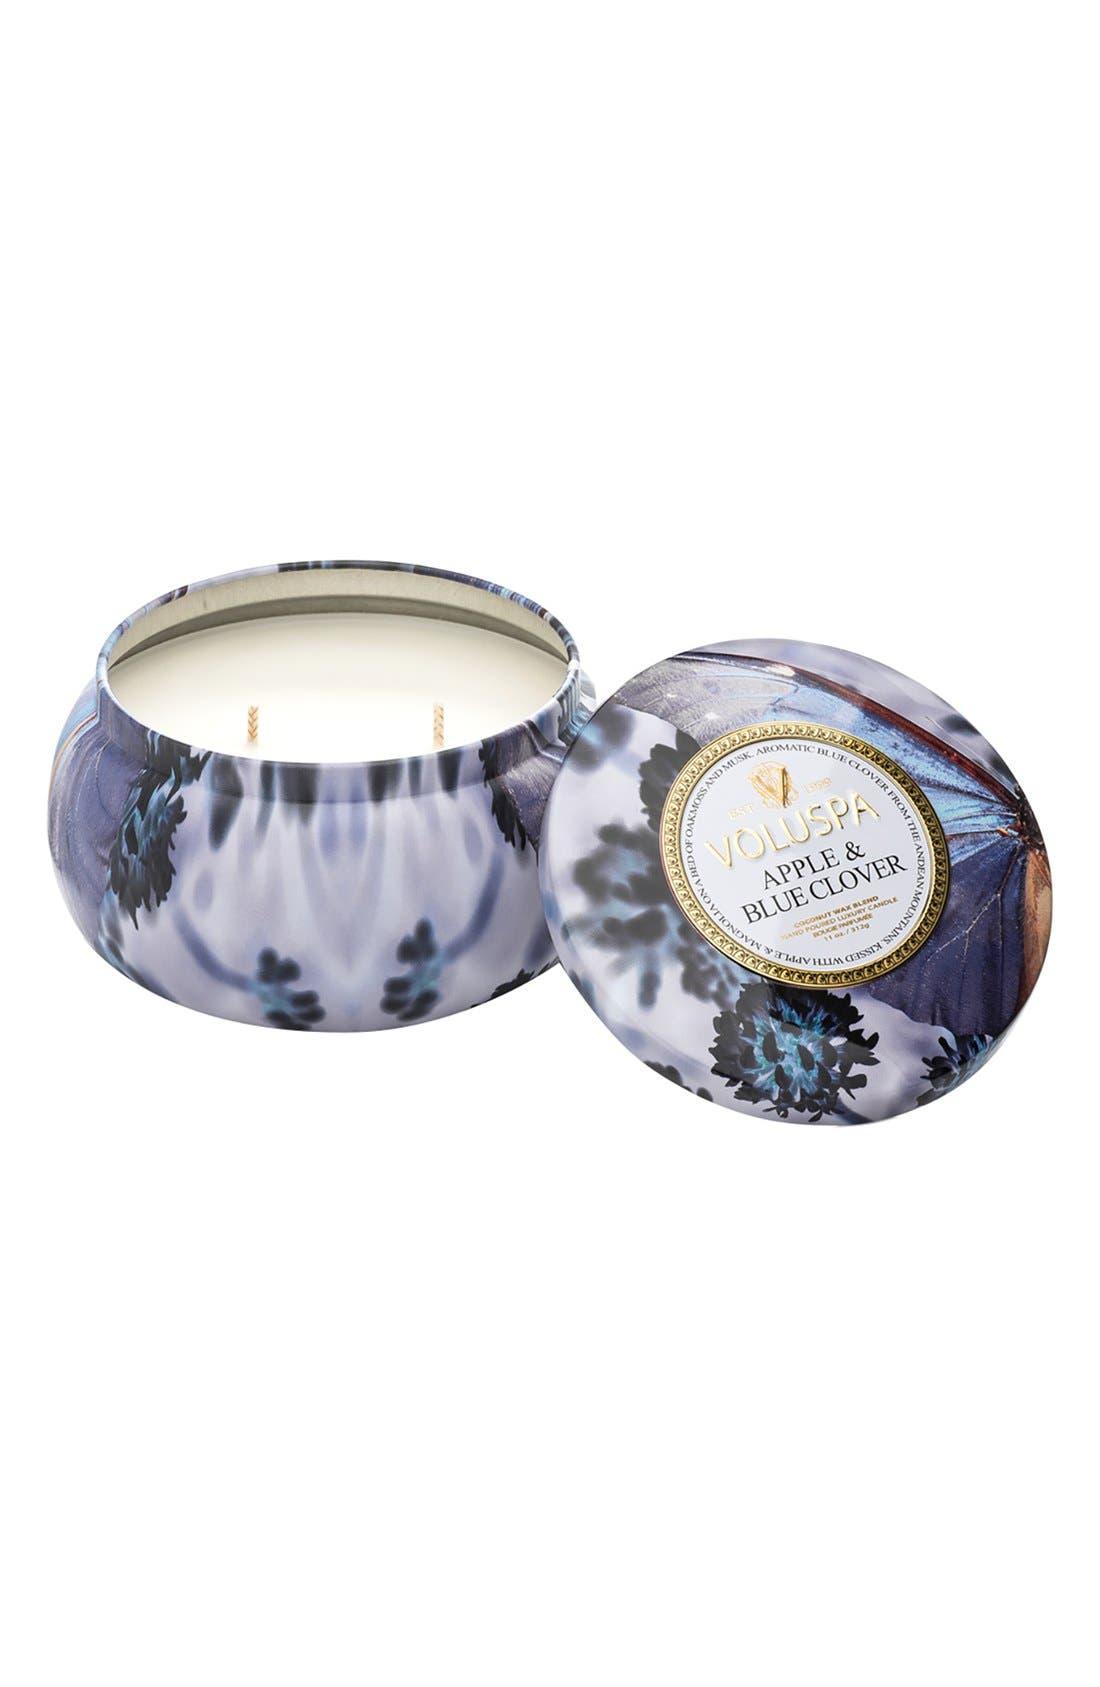 Maison Jardin Apple & Blue Clover Maison Metallo 2-Wick Candle,                         Main,                         color, Apple Blue Clover